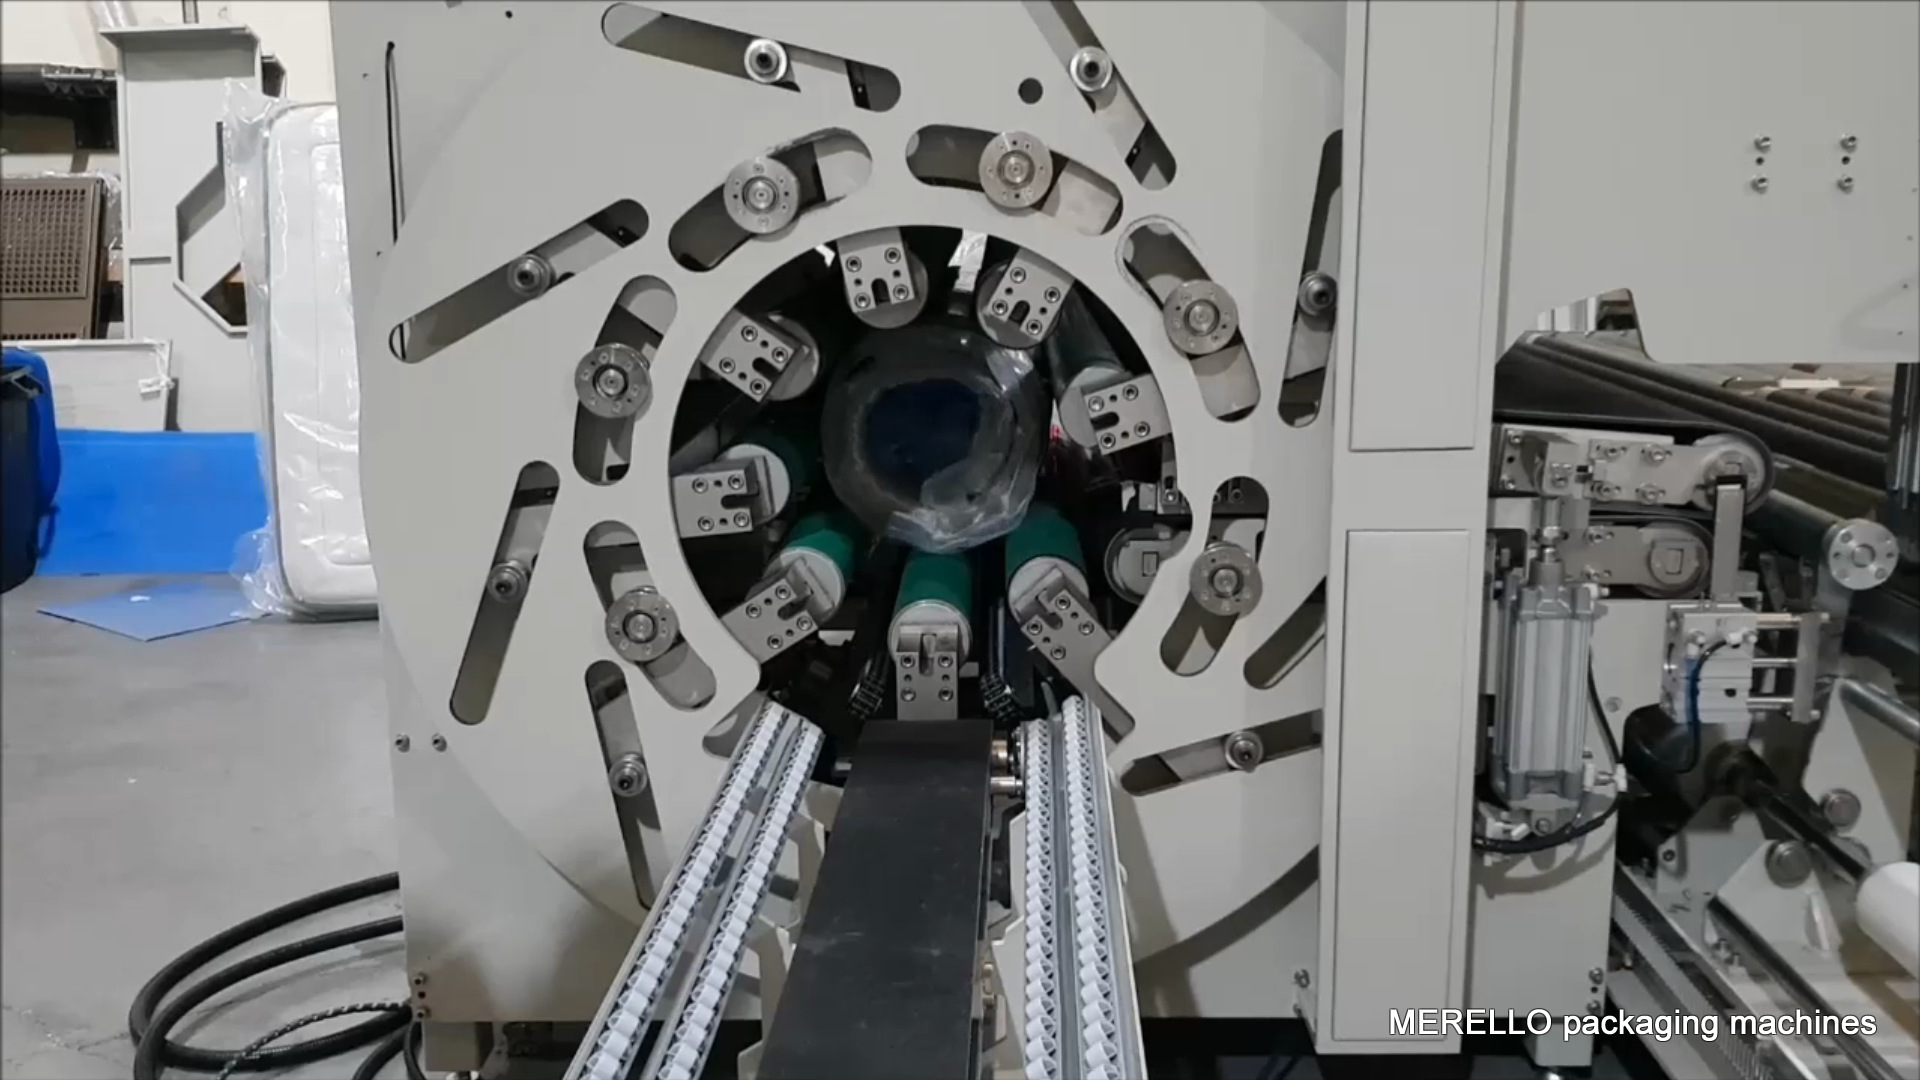 maquina enrrolladora de colchones y toppers linea completa